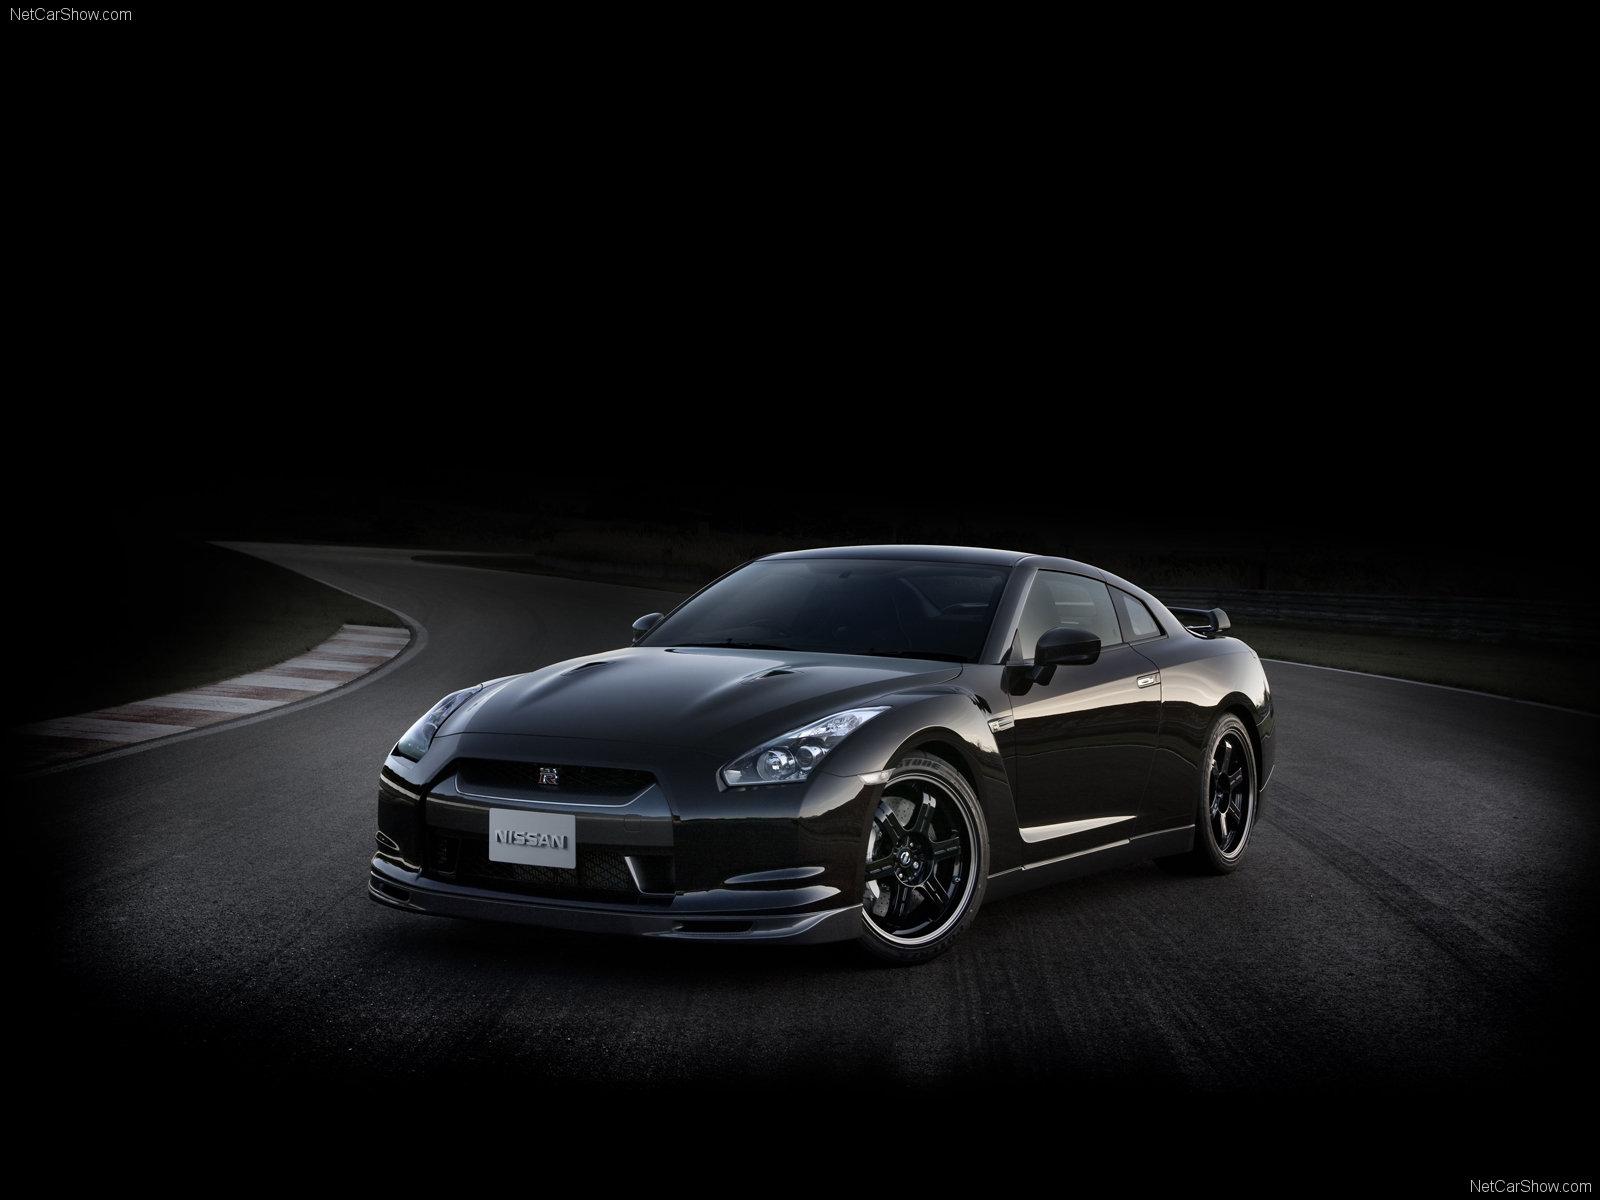 Gran Turismo 6 Nissan GTR HD desktop wallpaper  - nissan gtr gran turismo wallpapers